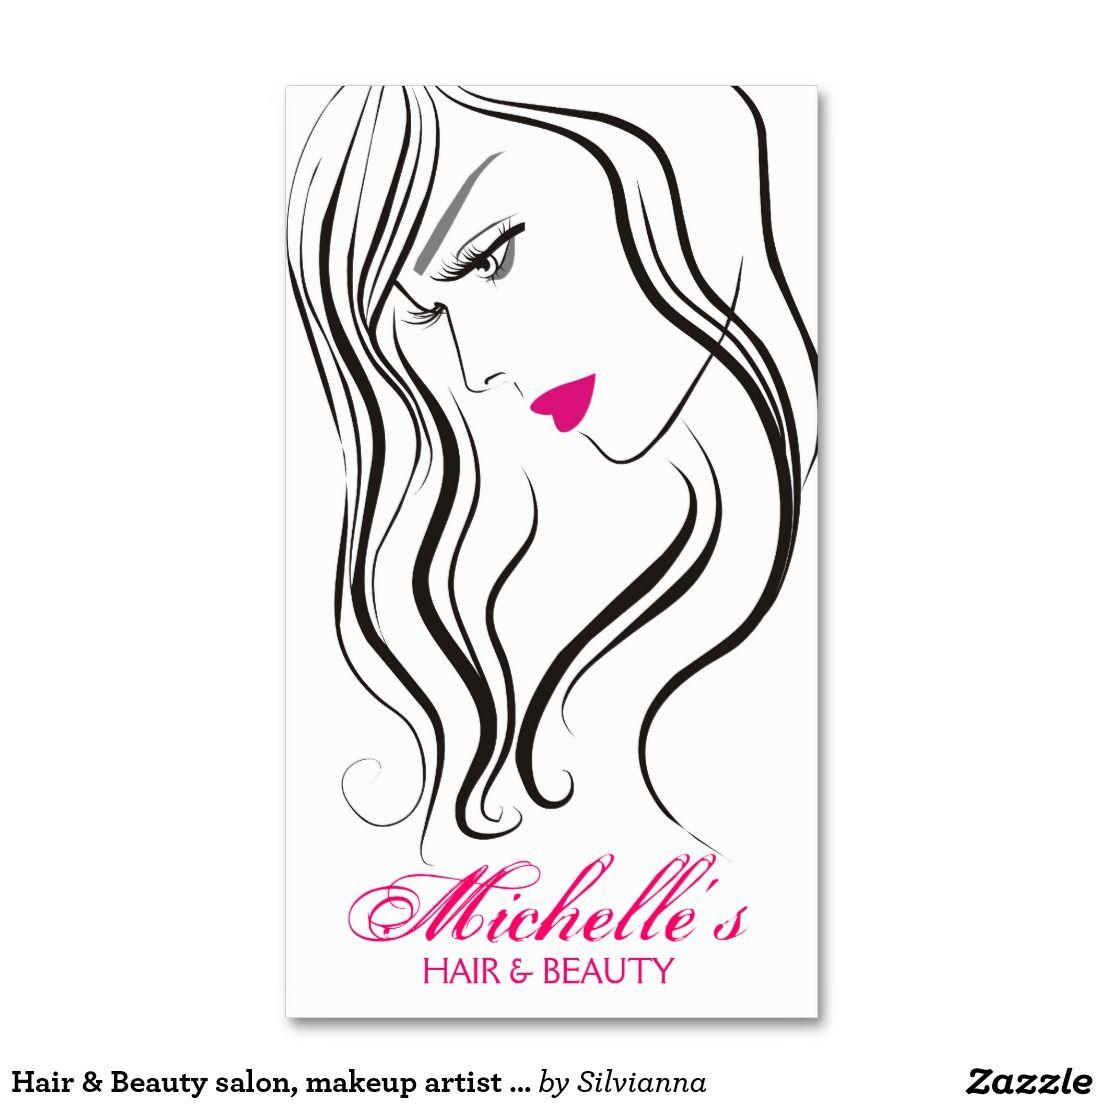 1104x1104 Hair Amp Beauty Salon, Makeup Artist Business Card Hair And Beauty